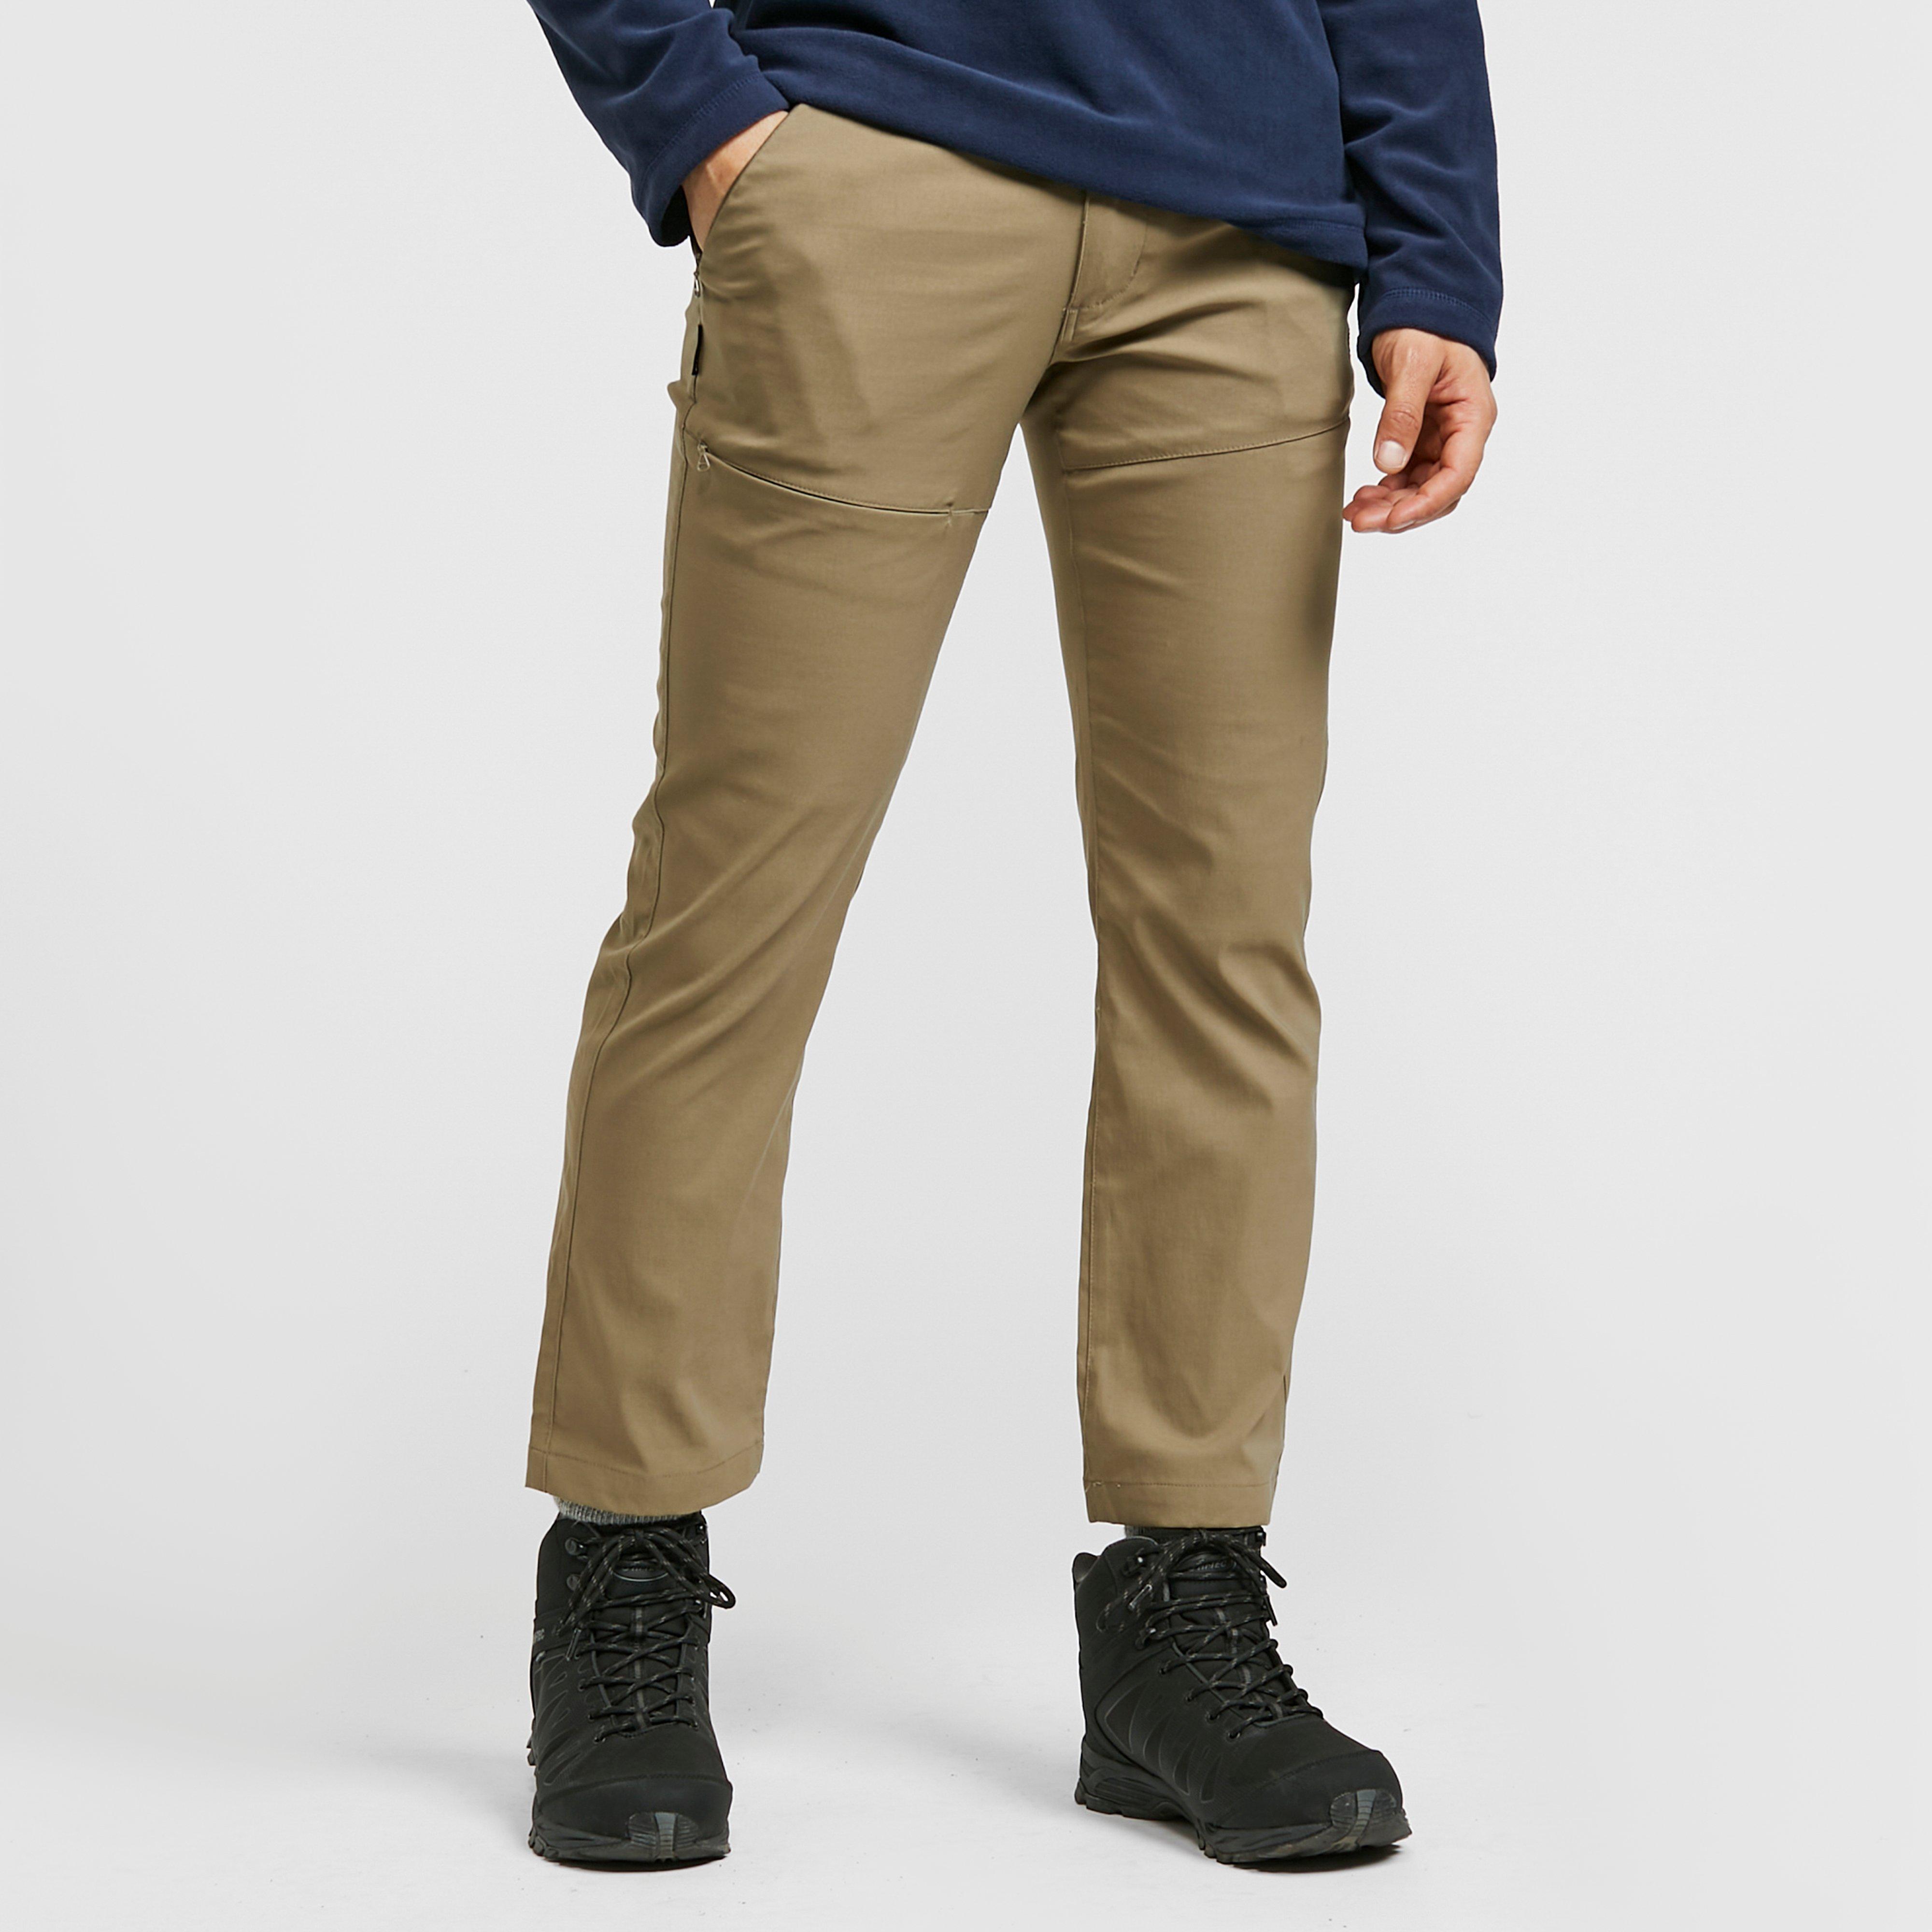 Craghoppers Men's Kiwi Pro Stretch Trousers (Regular) - Beige, Beige